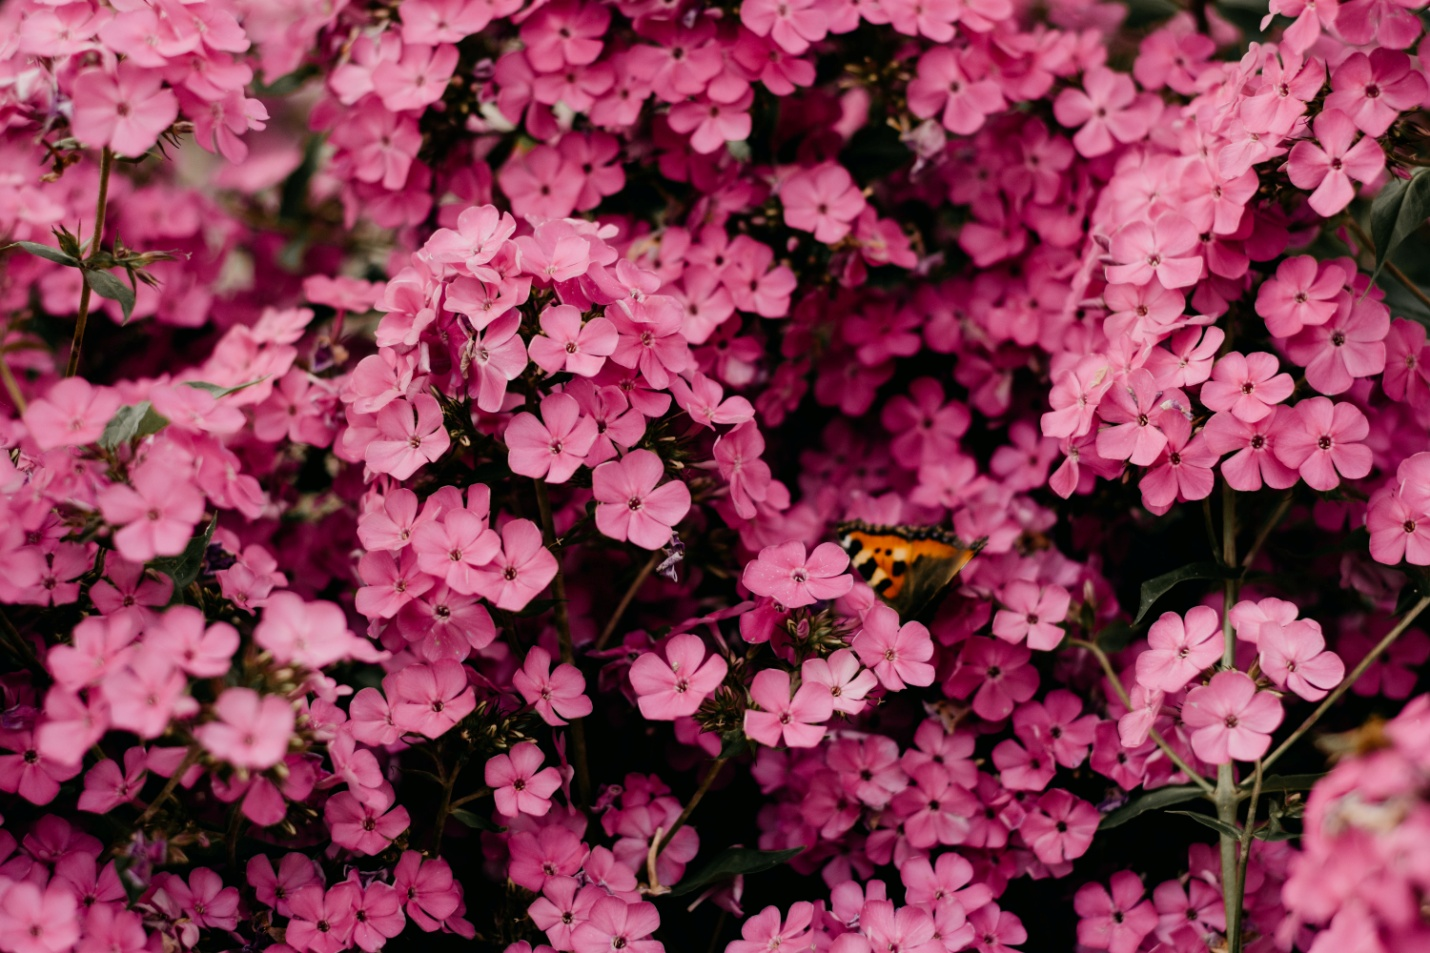 Planting pansies in your garden